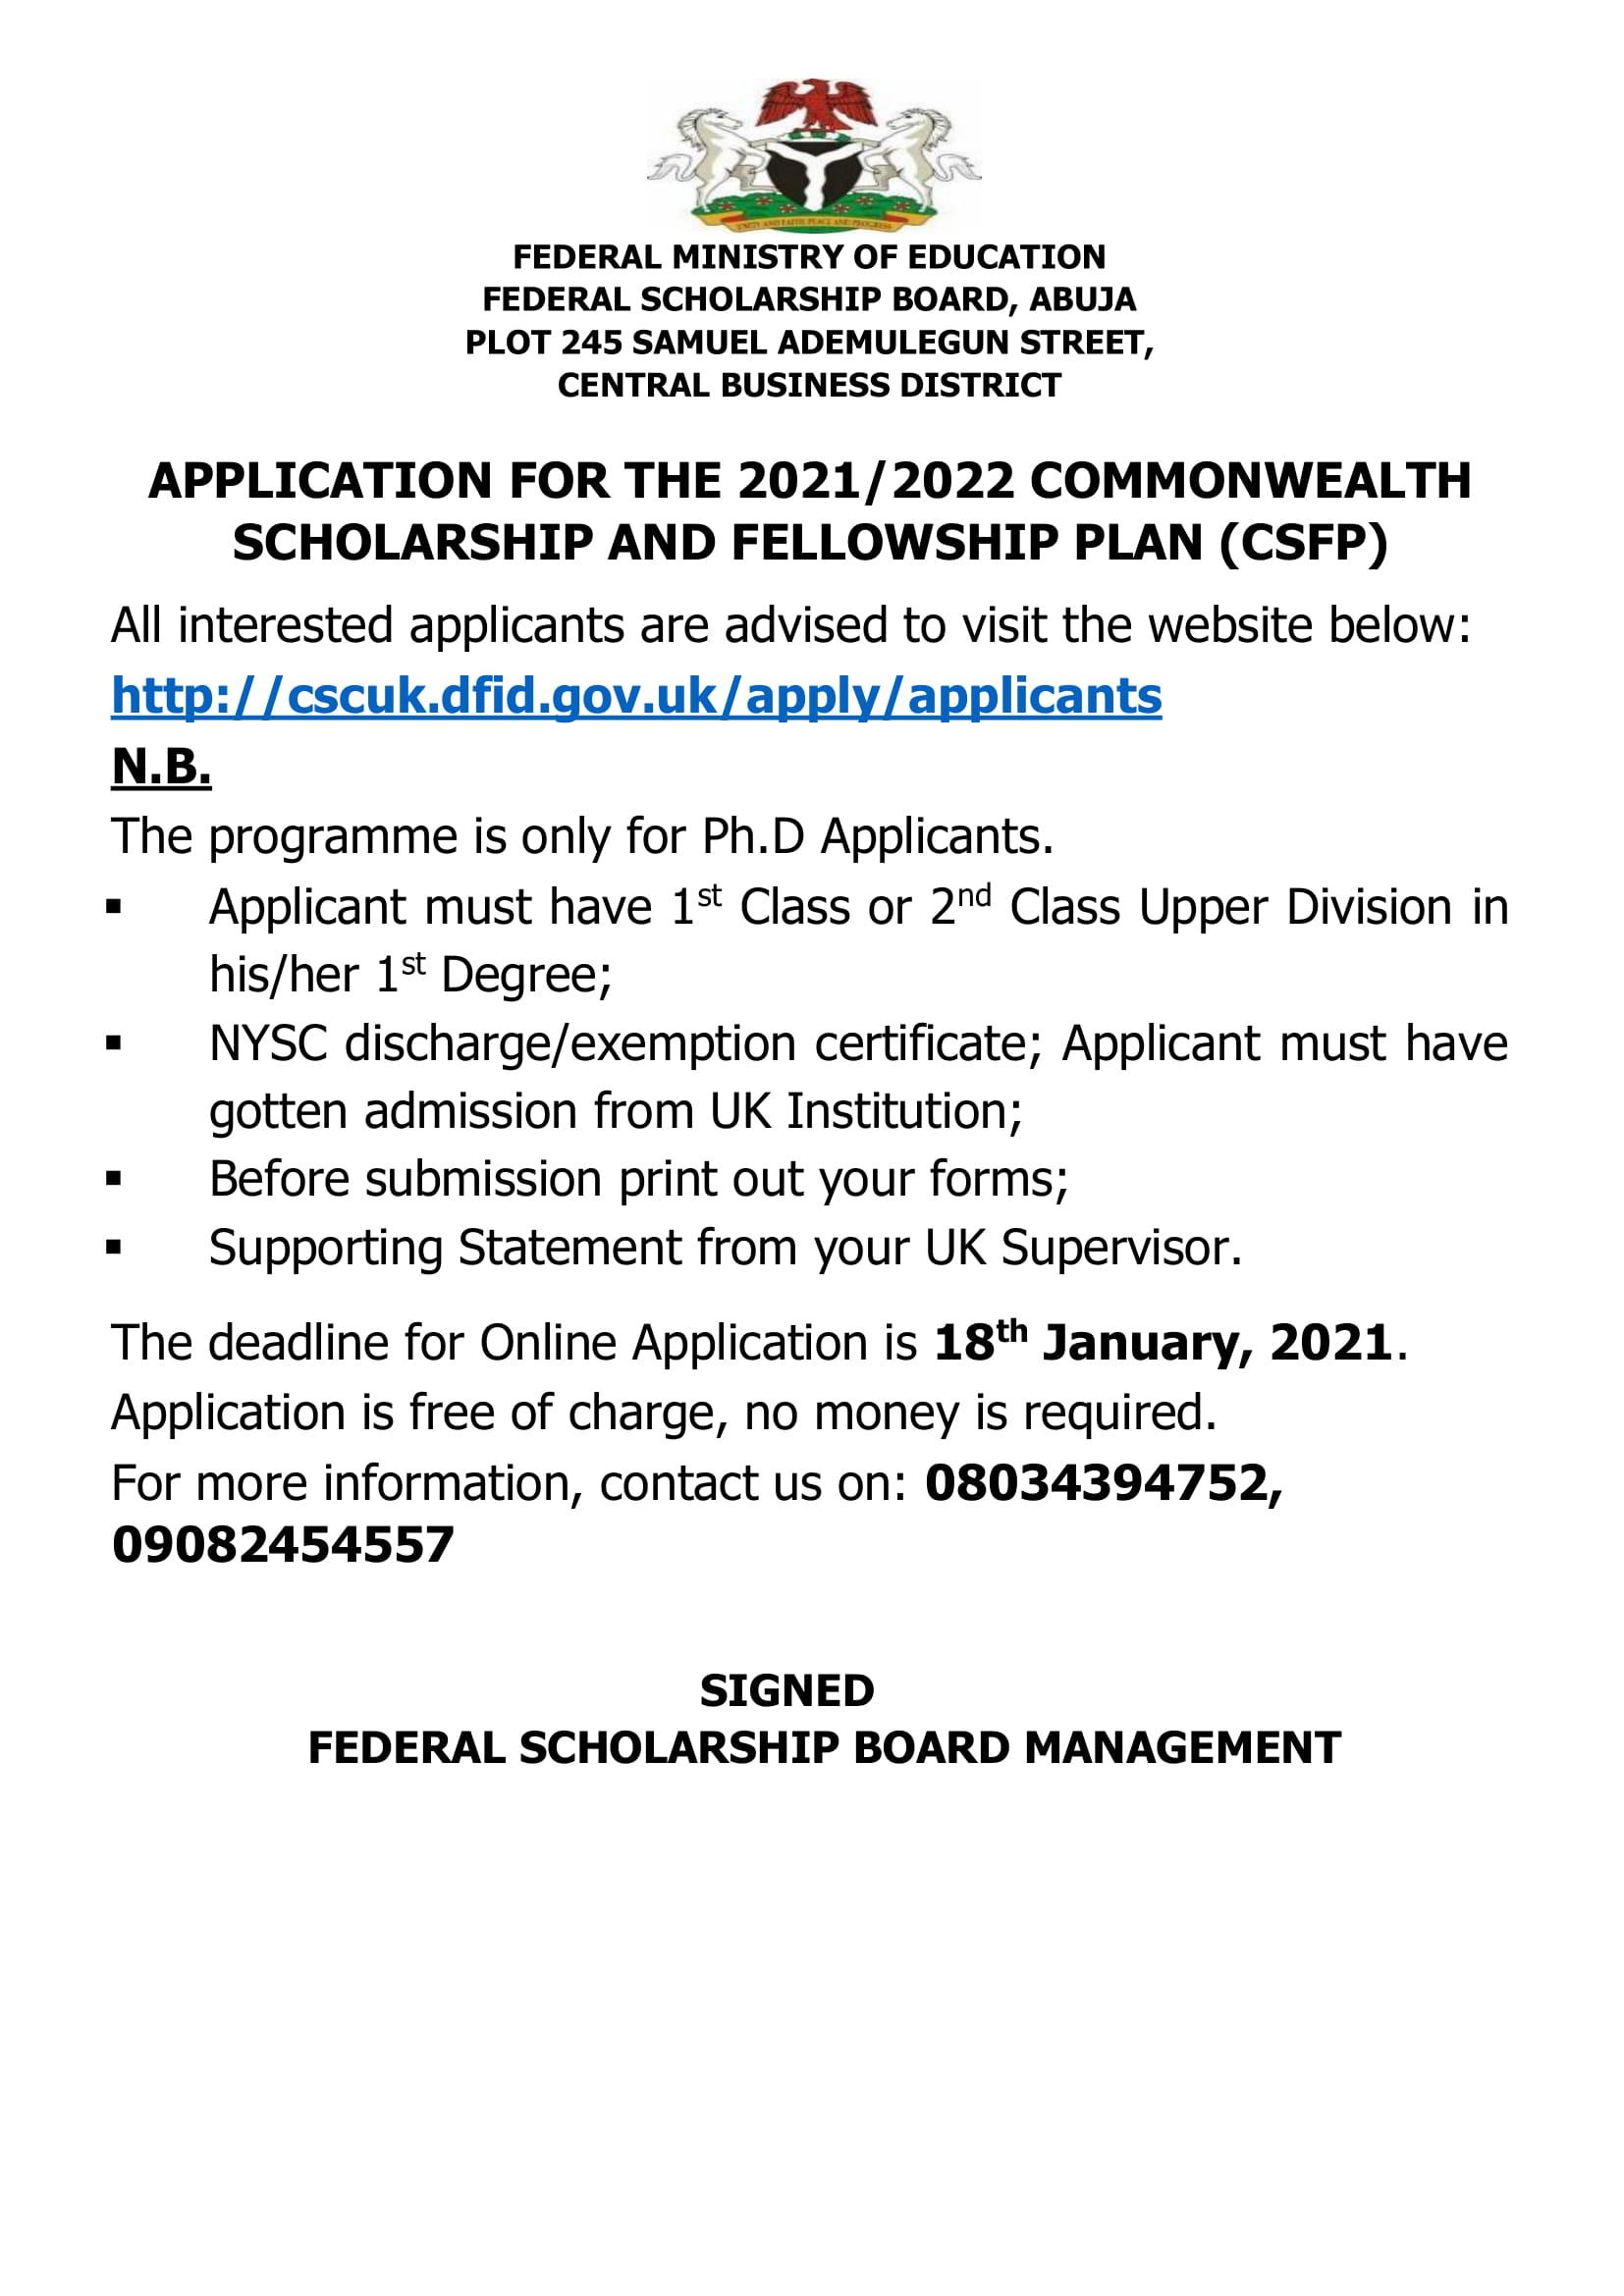 Commonwealth Scholarship and Fellowship Plan 2021/2022